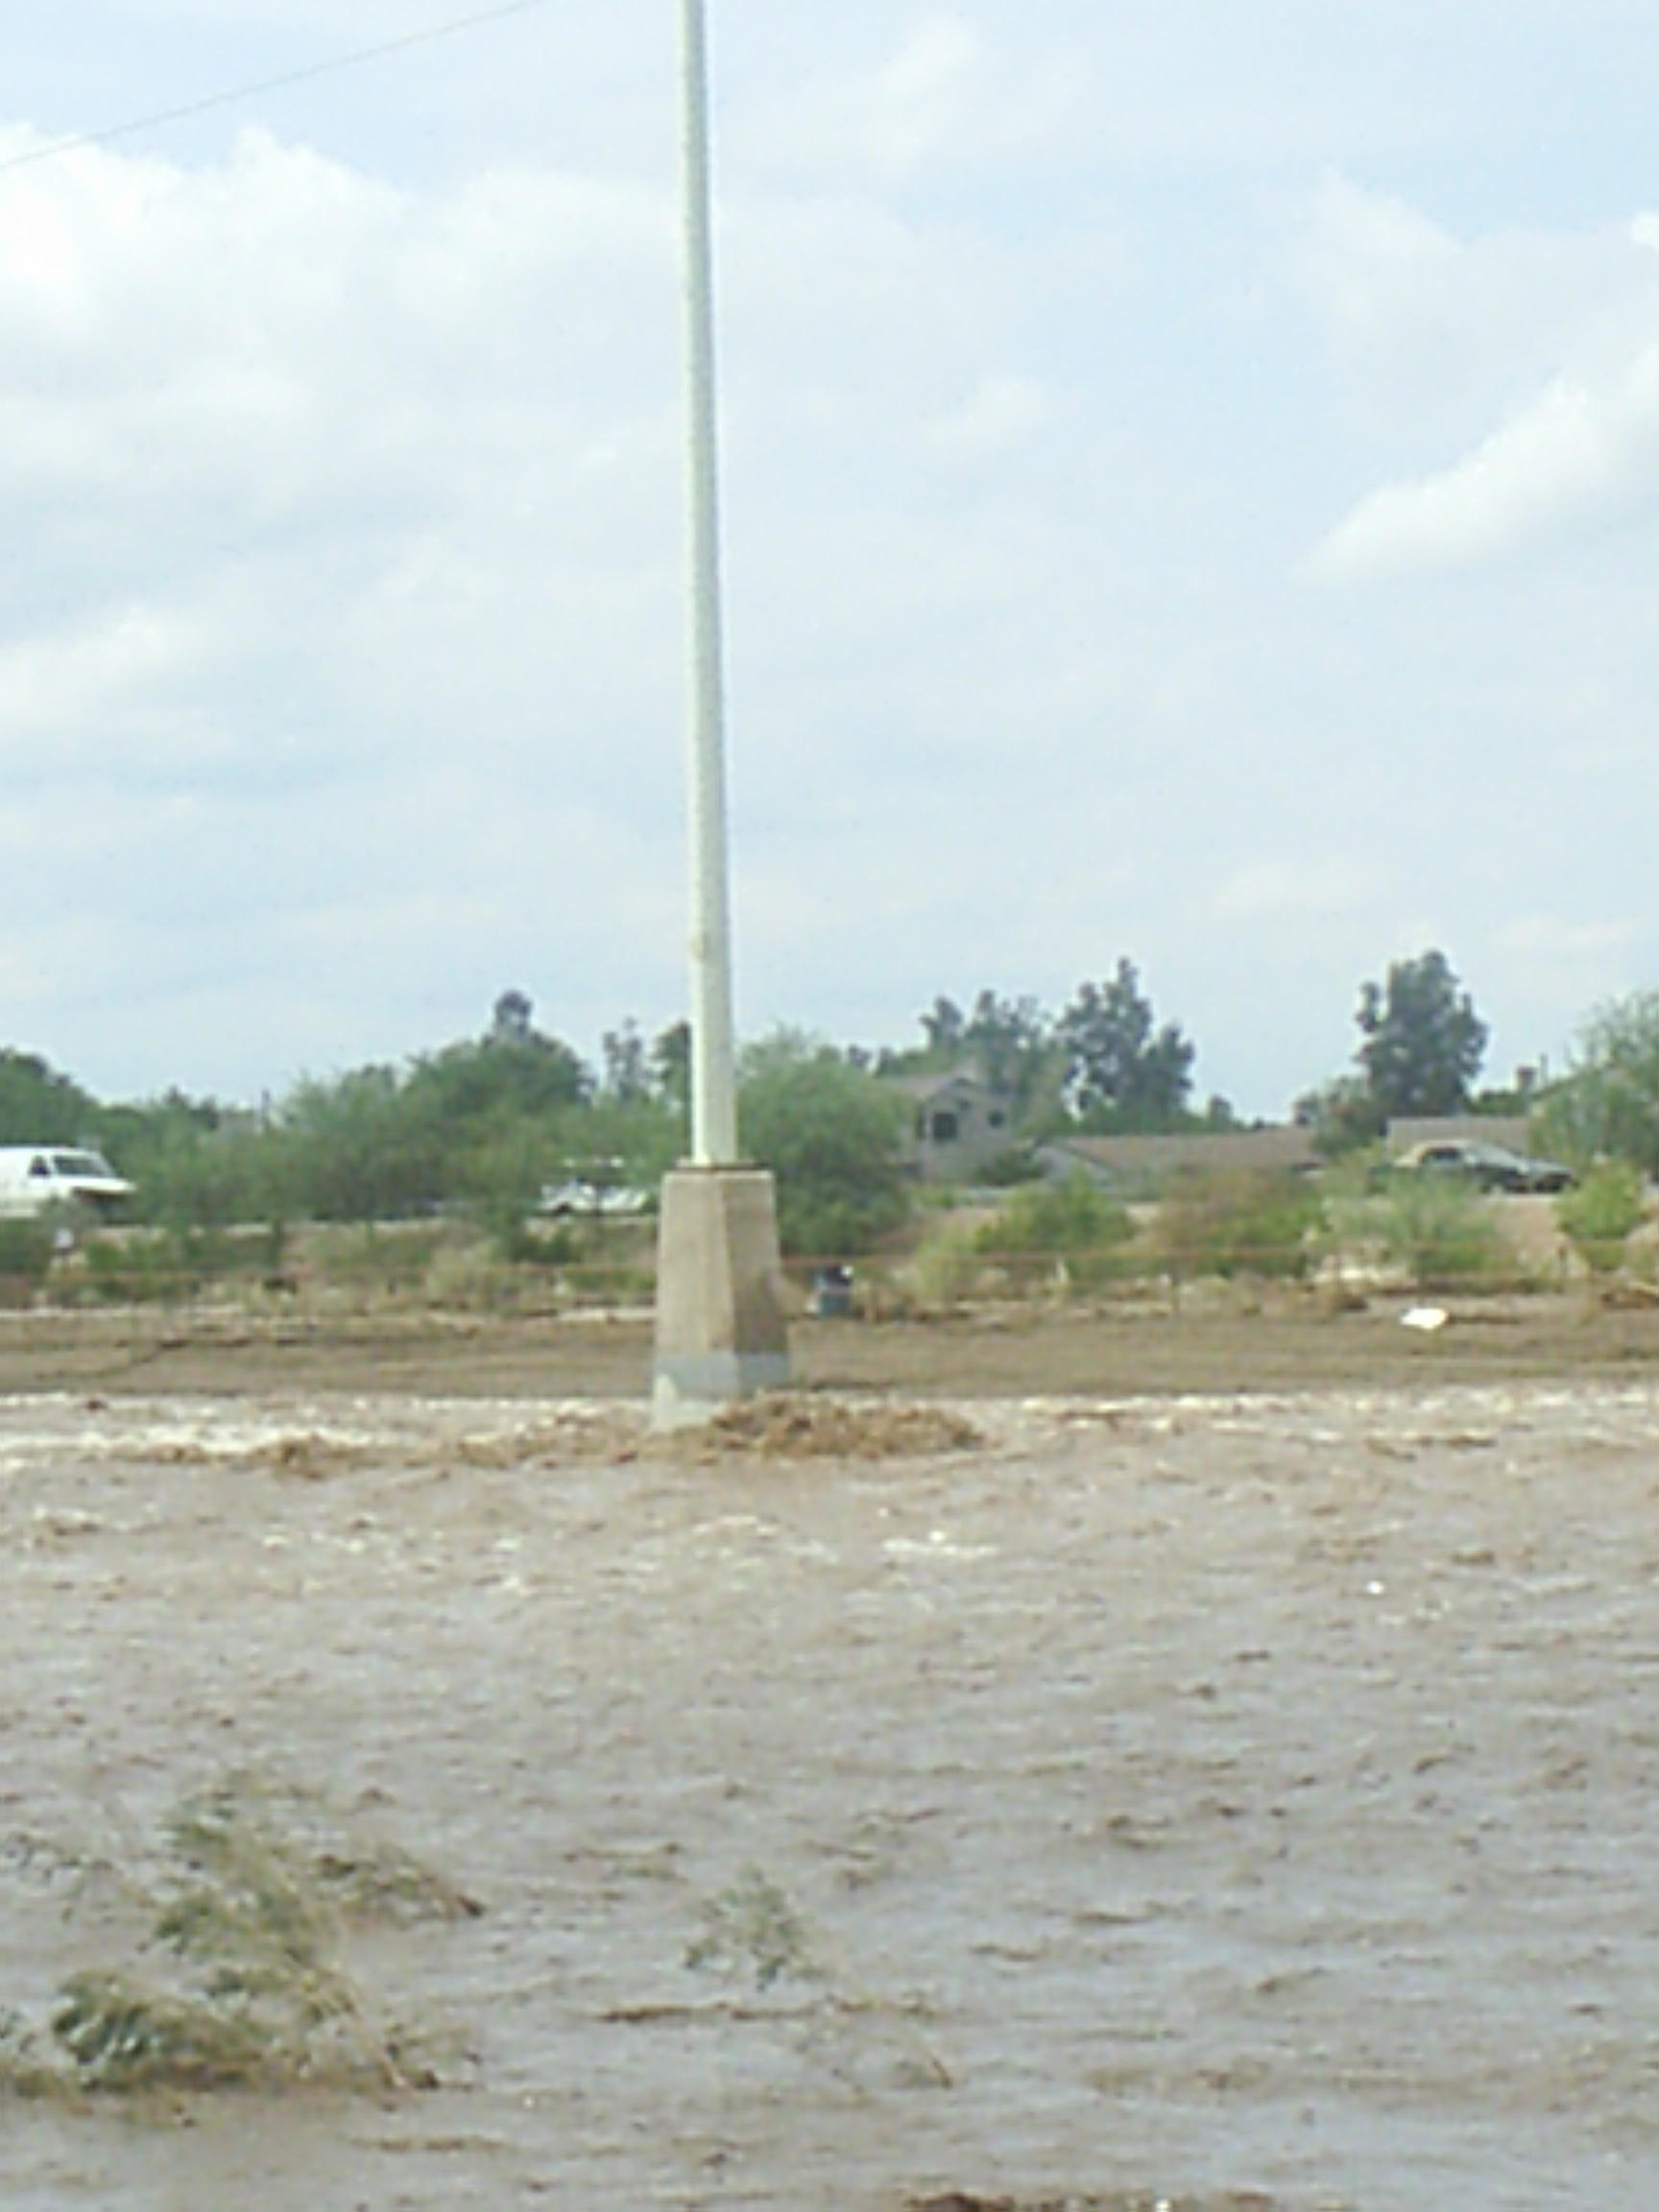 rillito chat Webcams around arizona tucson cams, tucson webcams, tucson panorama, university of arizona, mount lemmon, phoenix highway, streaming, tucson air quality, phoenix road conditions, flash flood videos, and wecams outside arizona.